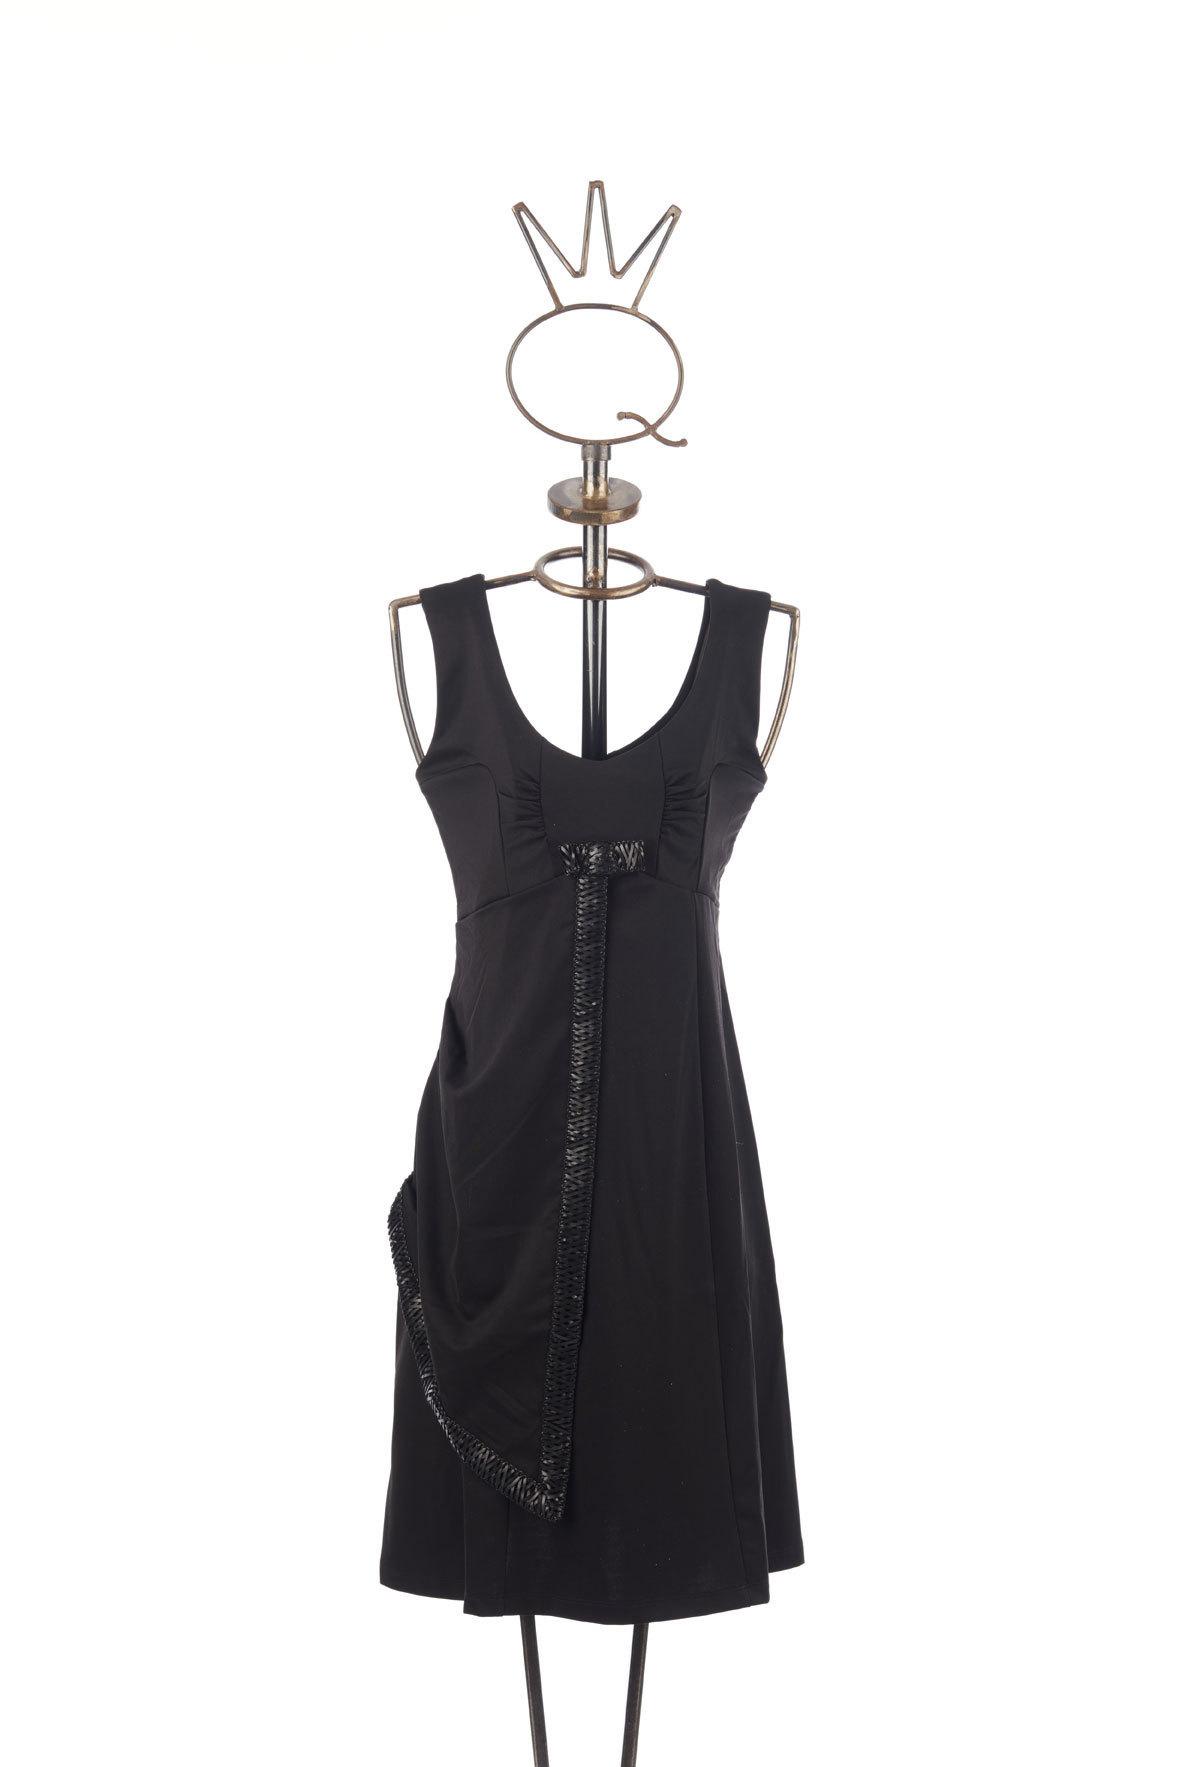 Save the Queen: Asymmetrical Draped Black Bow Dress (1 Left!) STQ_BLACK_BOW_N1